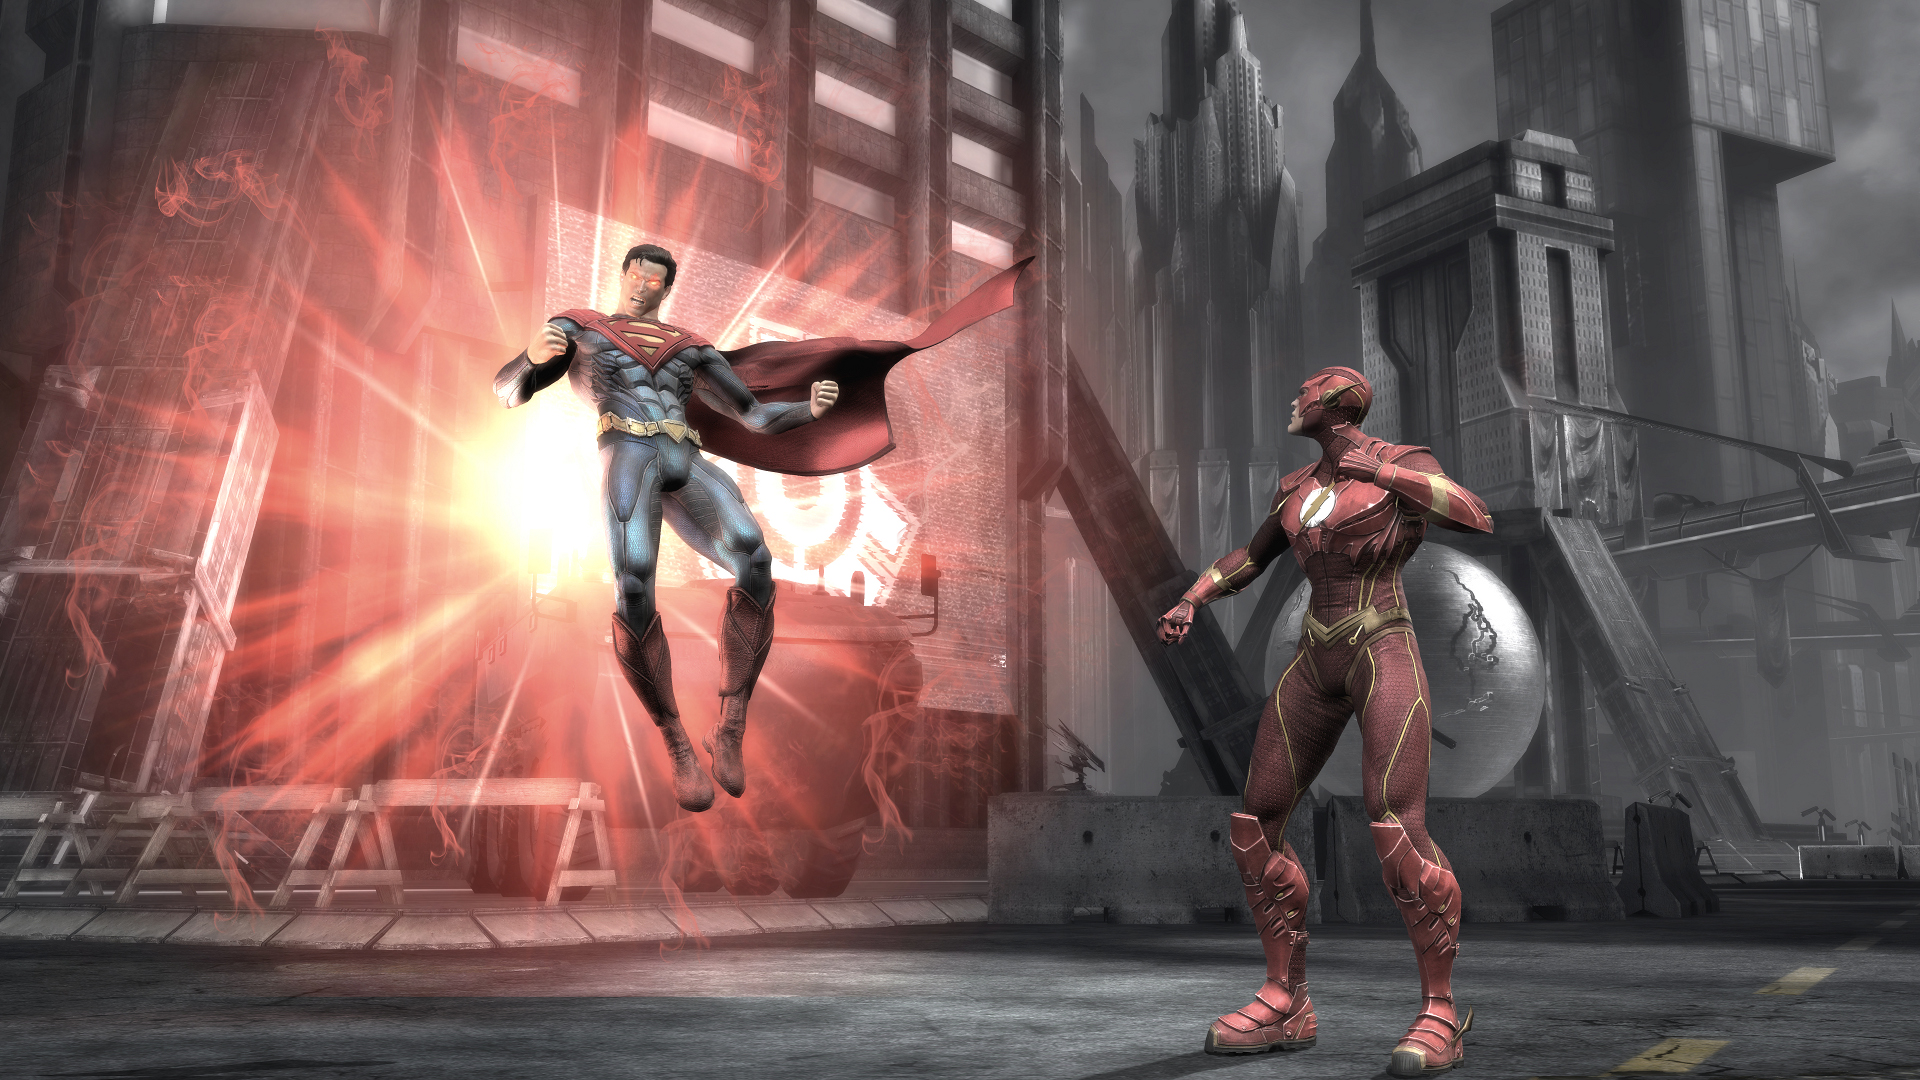 Doomsday estará disponible en Injustice: Gods Among Us [Video]